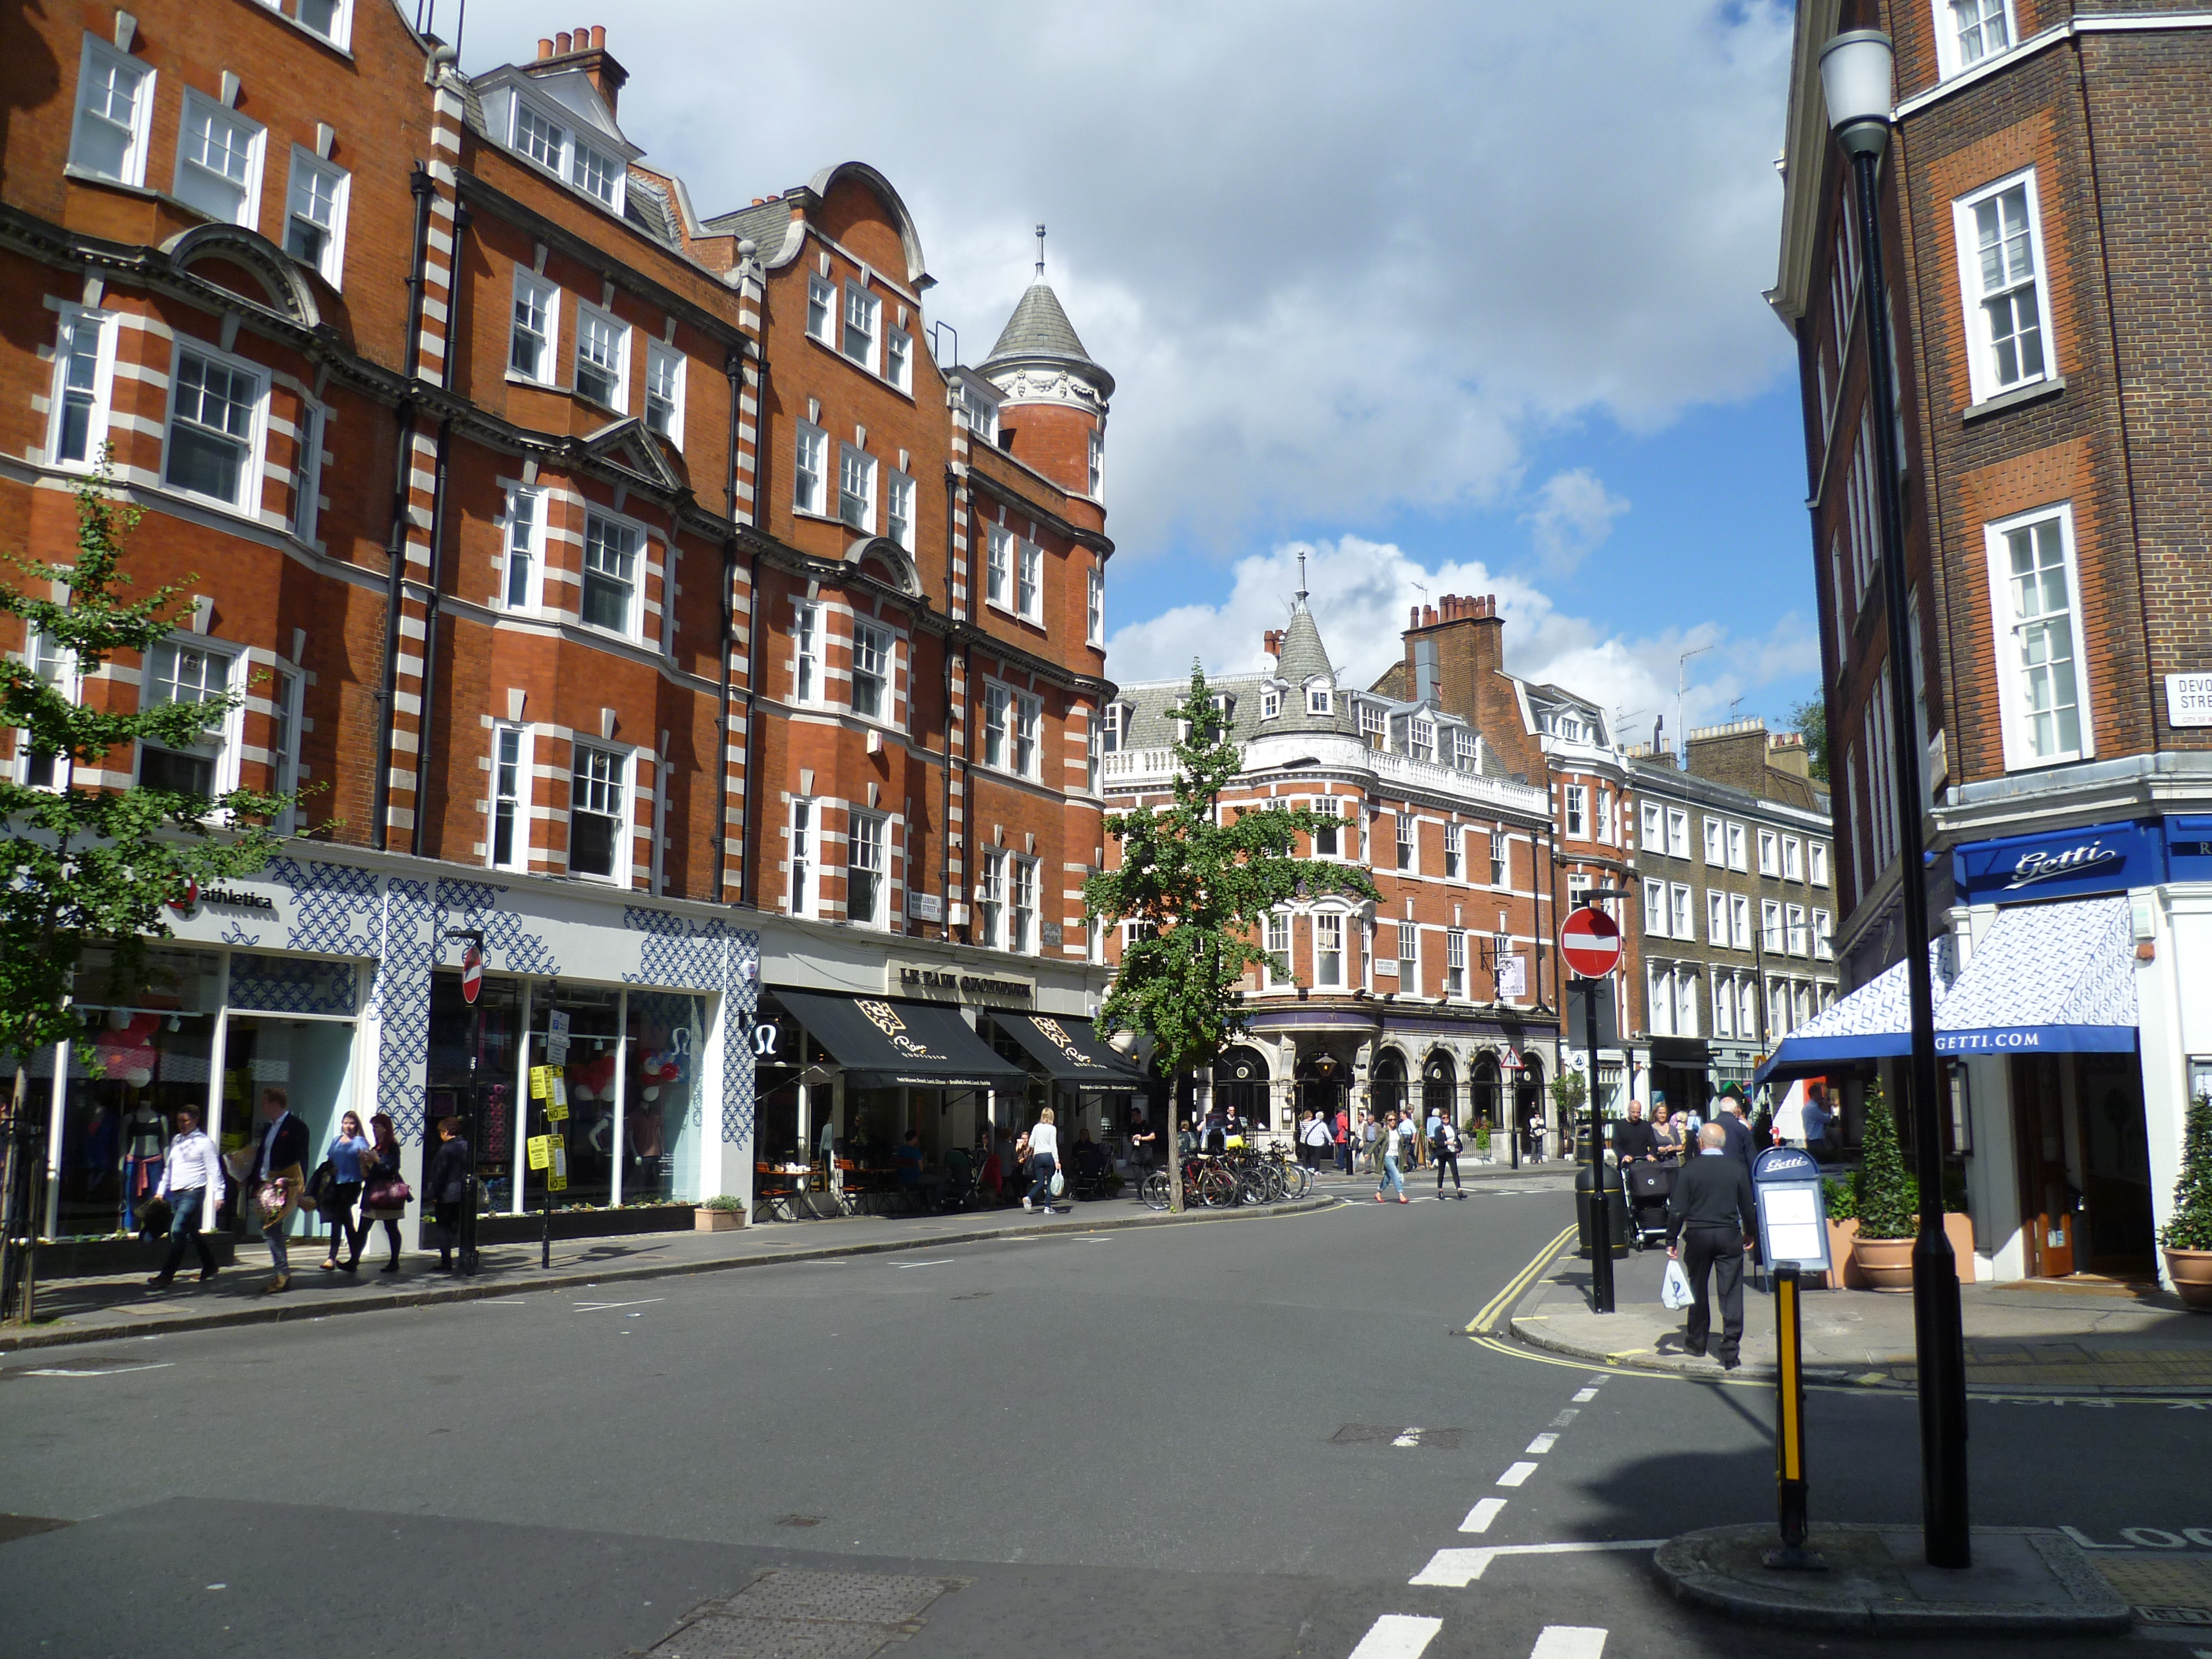 Marylebone_High_Street West End London office market